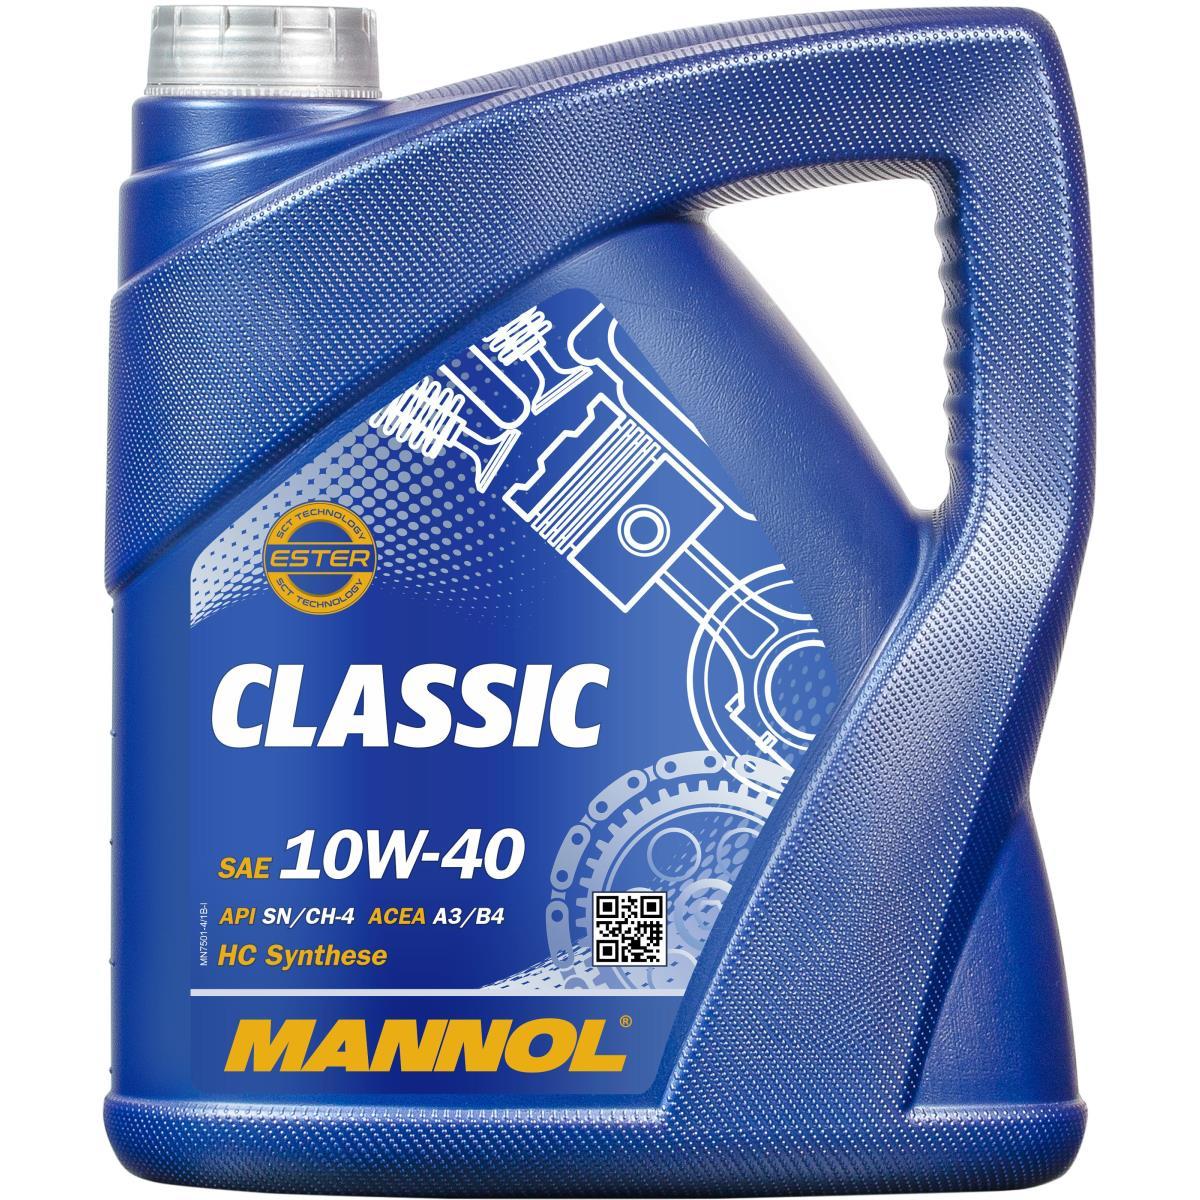 Aceite-del-motor-aceite-5w40-10w40-15w40-5w30-10w60-1l-4l-5l-7l-10l-20l miniatura 3